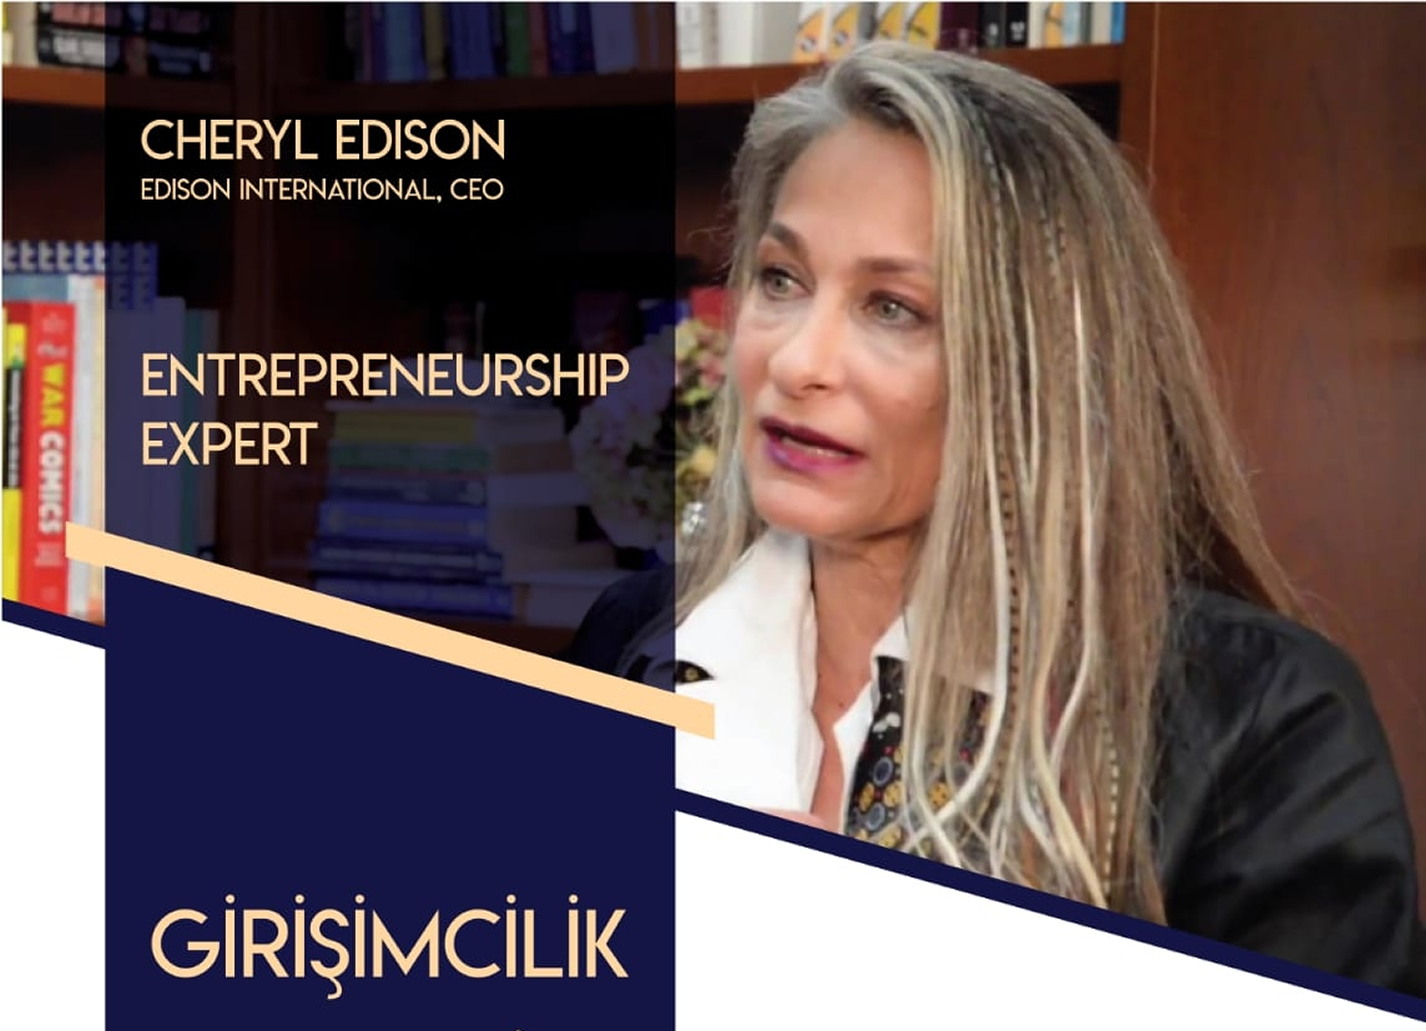 Cheryl Edison International/ CEO